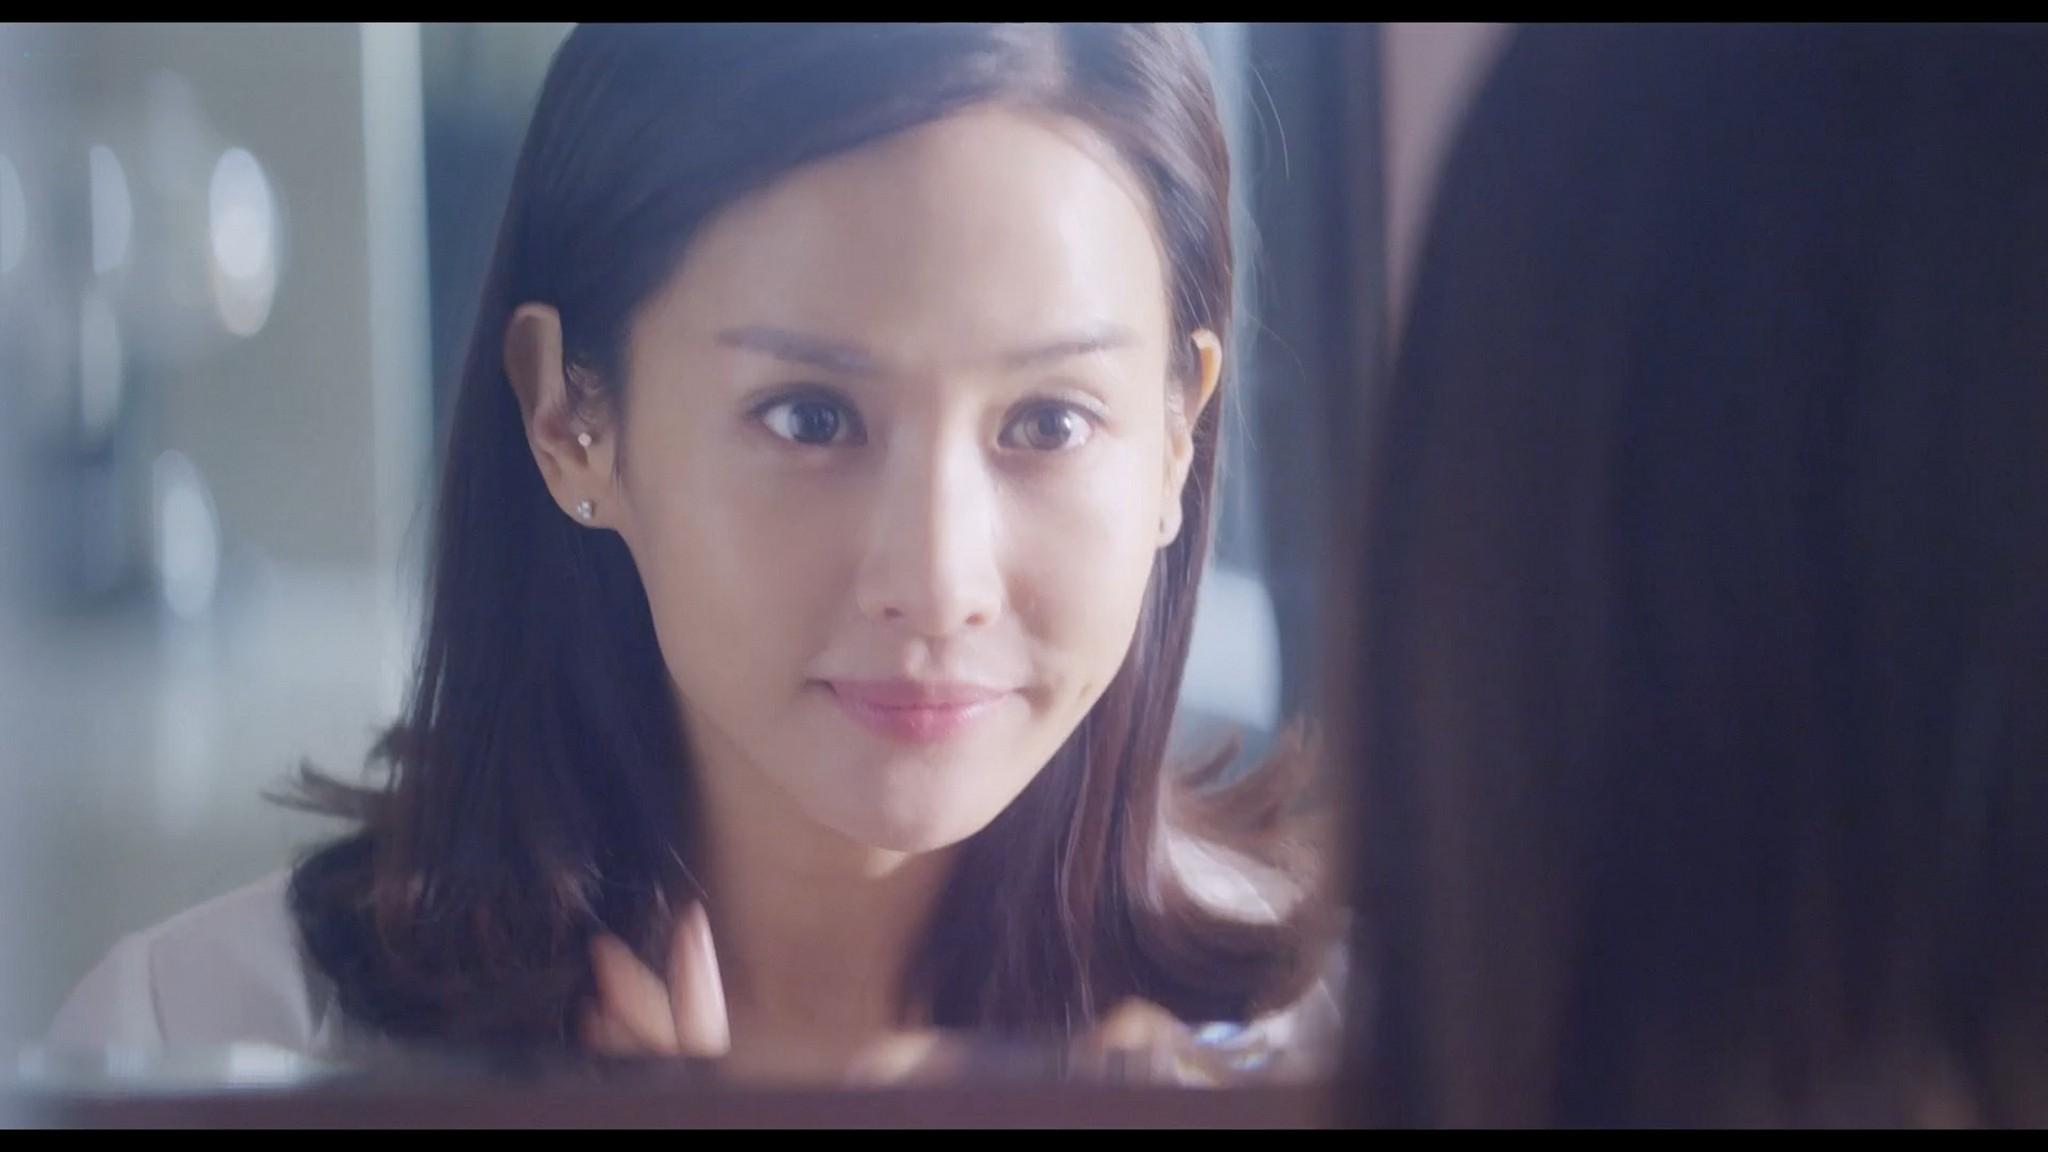 Yeo jeong Cho nude Clara Lee sexy Casa Amor Exclusive for Ladies 2015 1080p BluRay 3